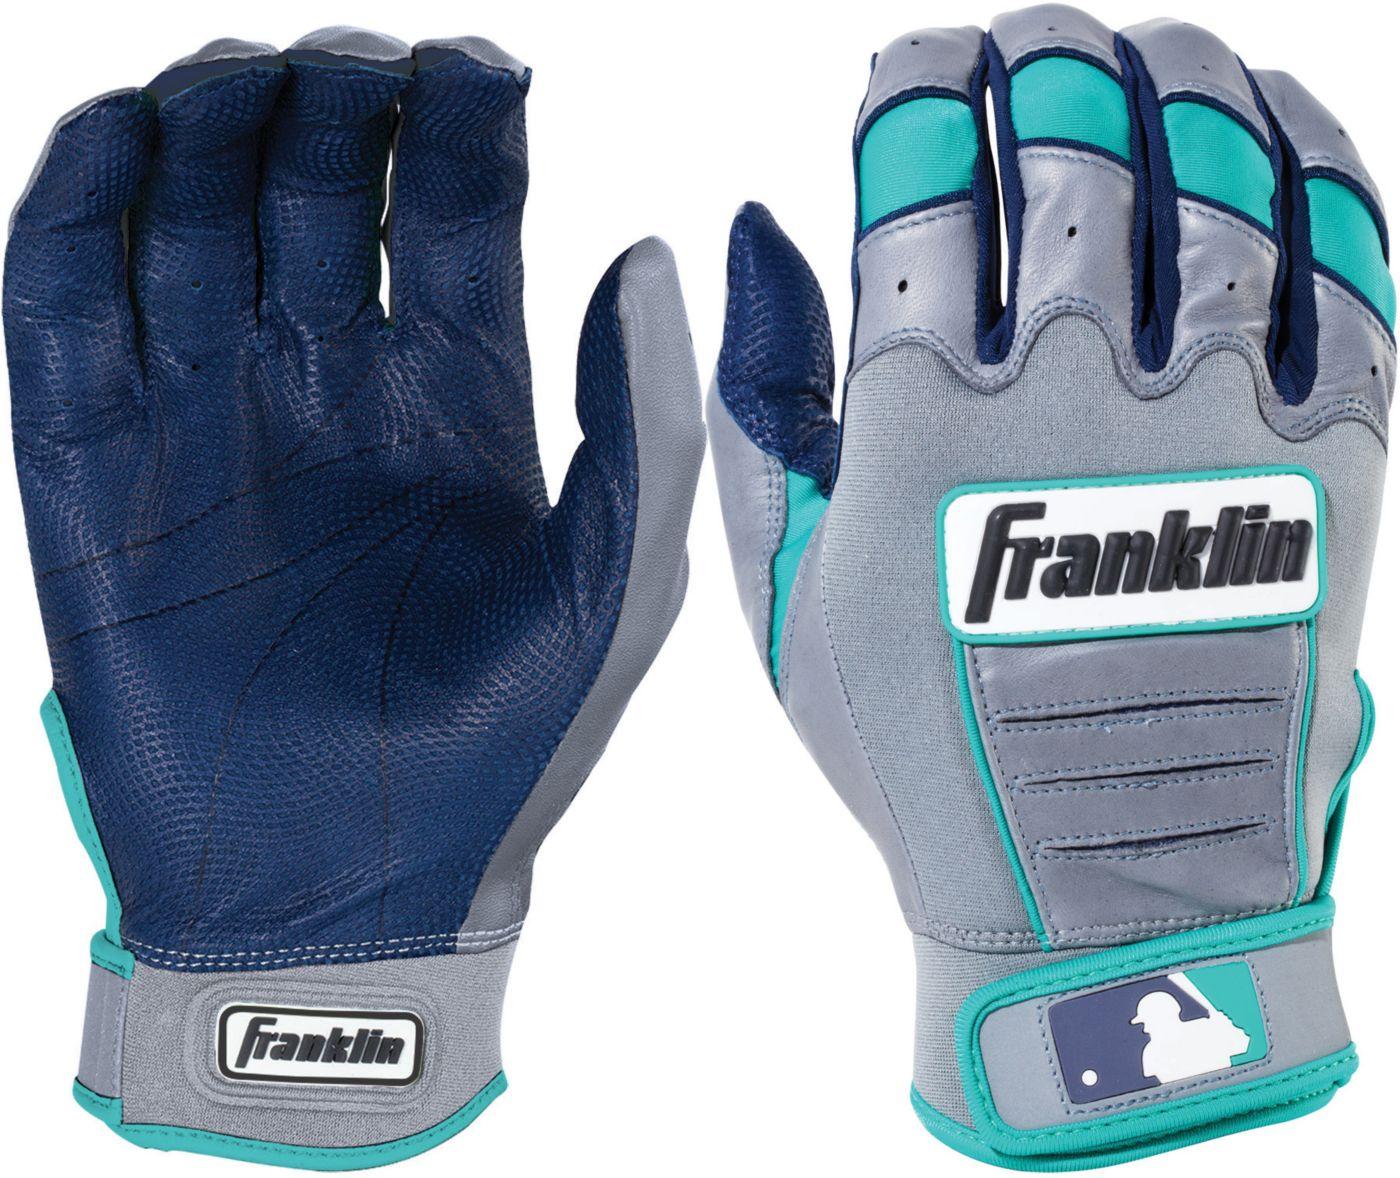 Franklin Youth Robinson Cano CFX Pro Series Batting Gloves